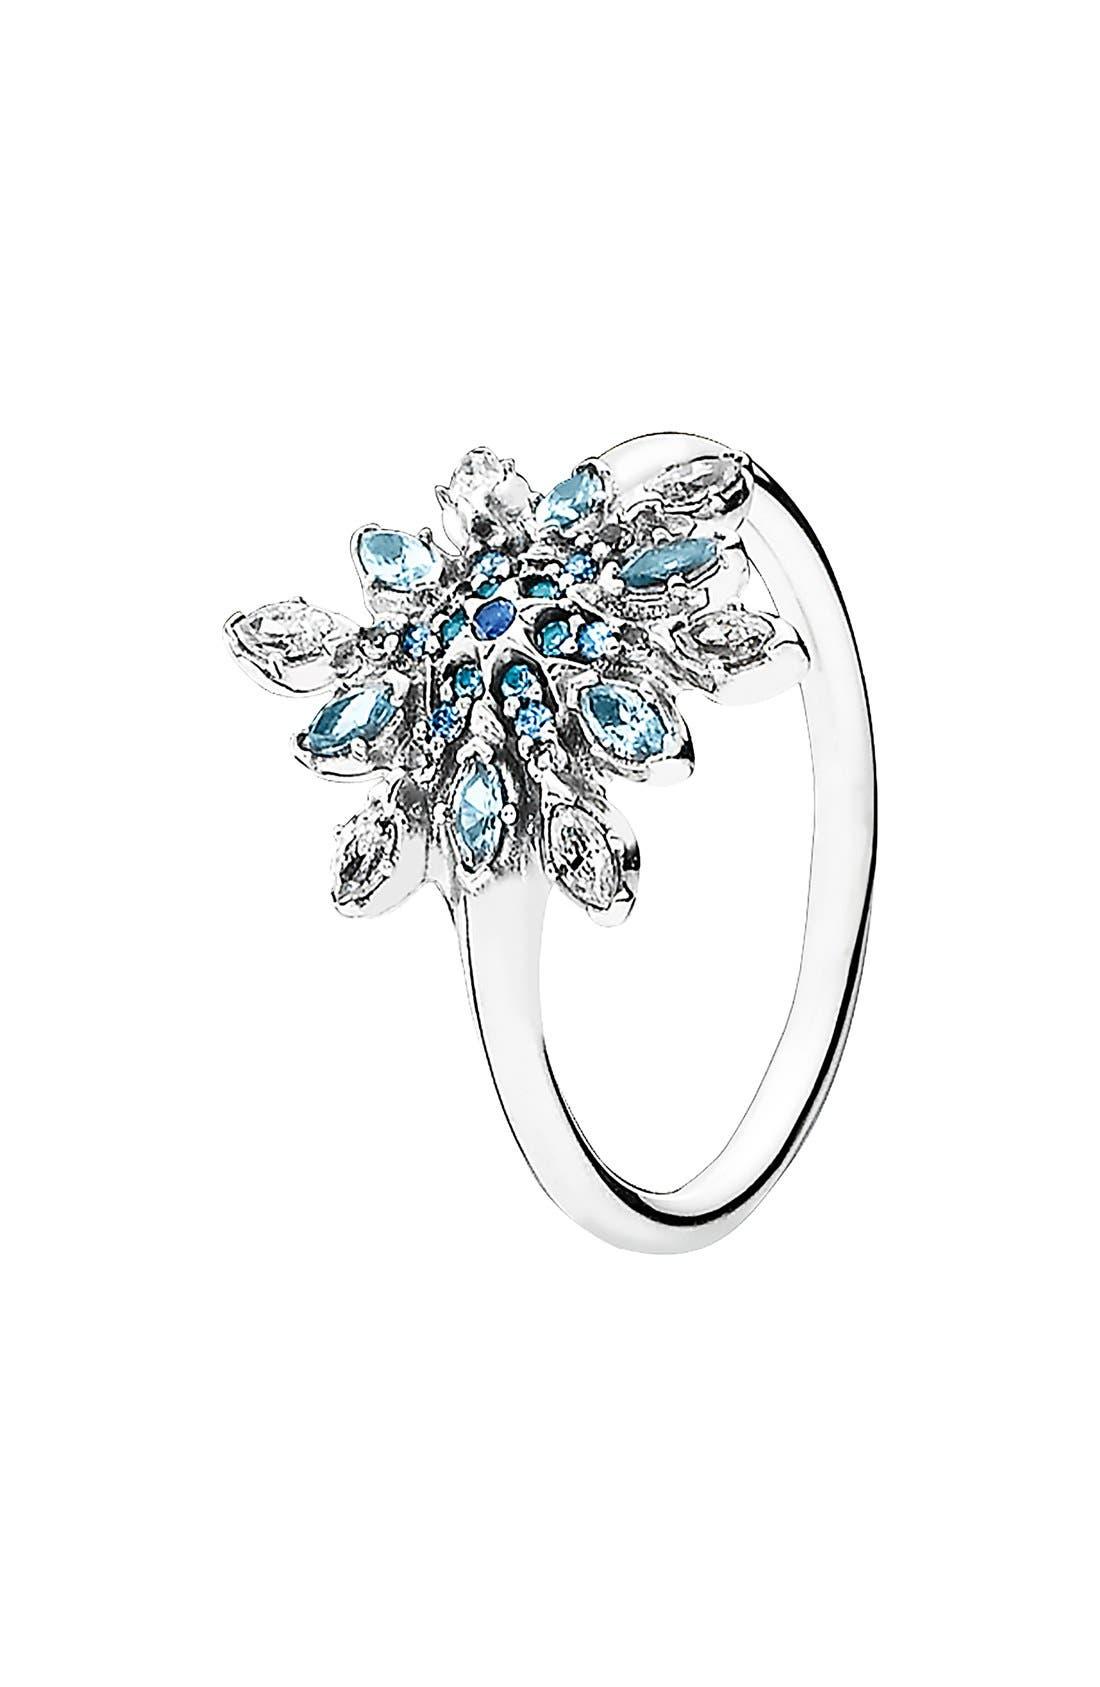 Alternate Image 1 Selected - PANDORA 'Snowflake' Cubic Zirconia Ring